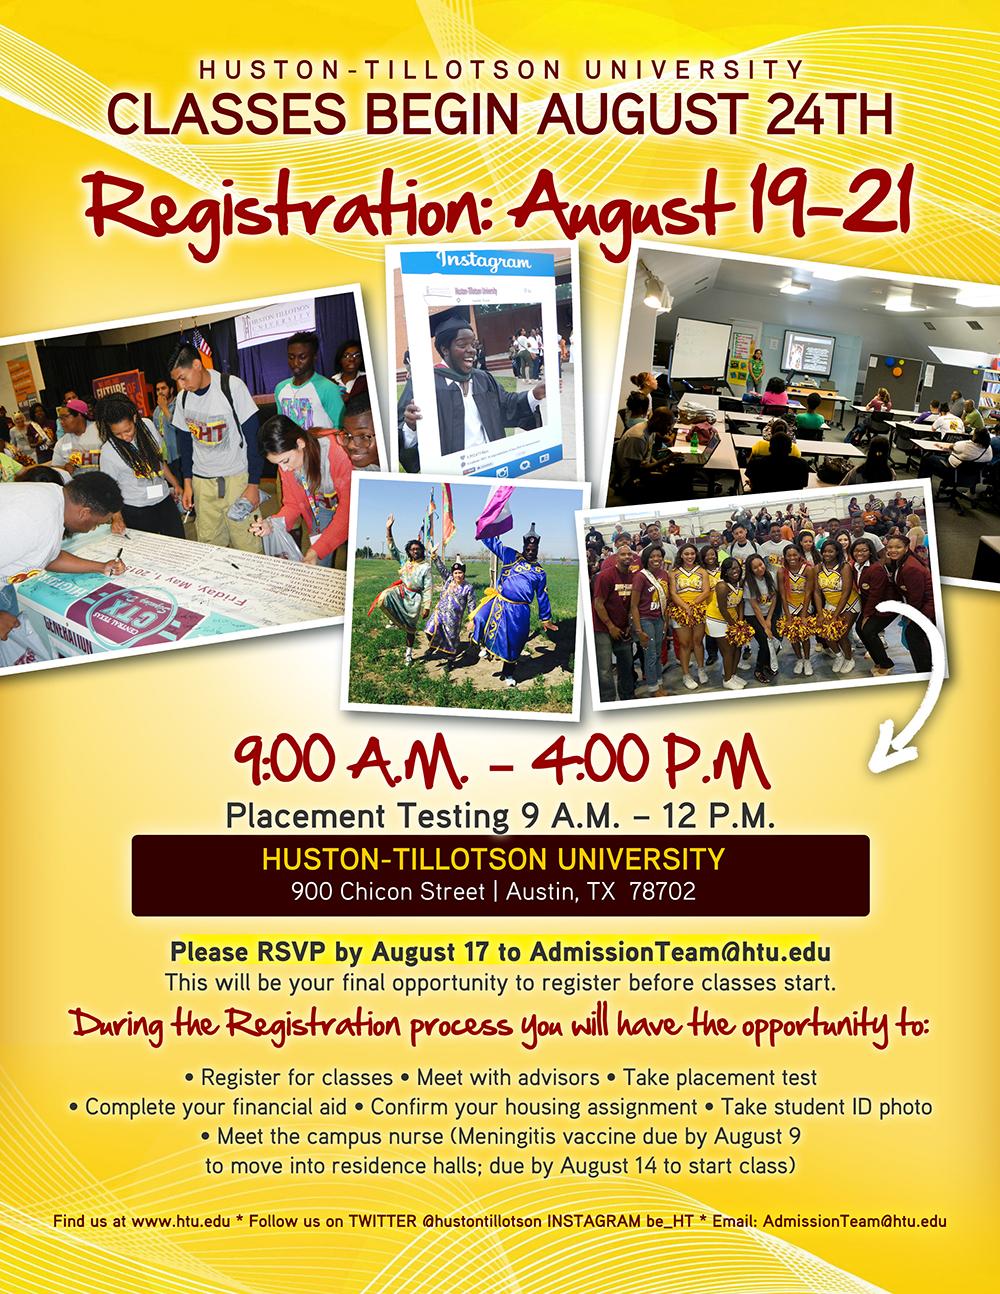 Aug 19-21 Registration